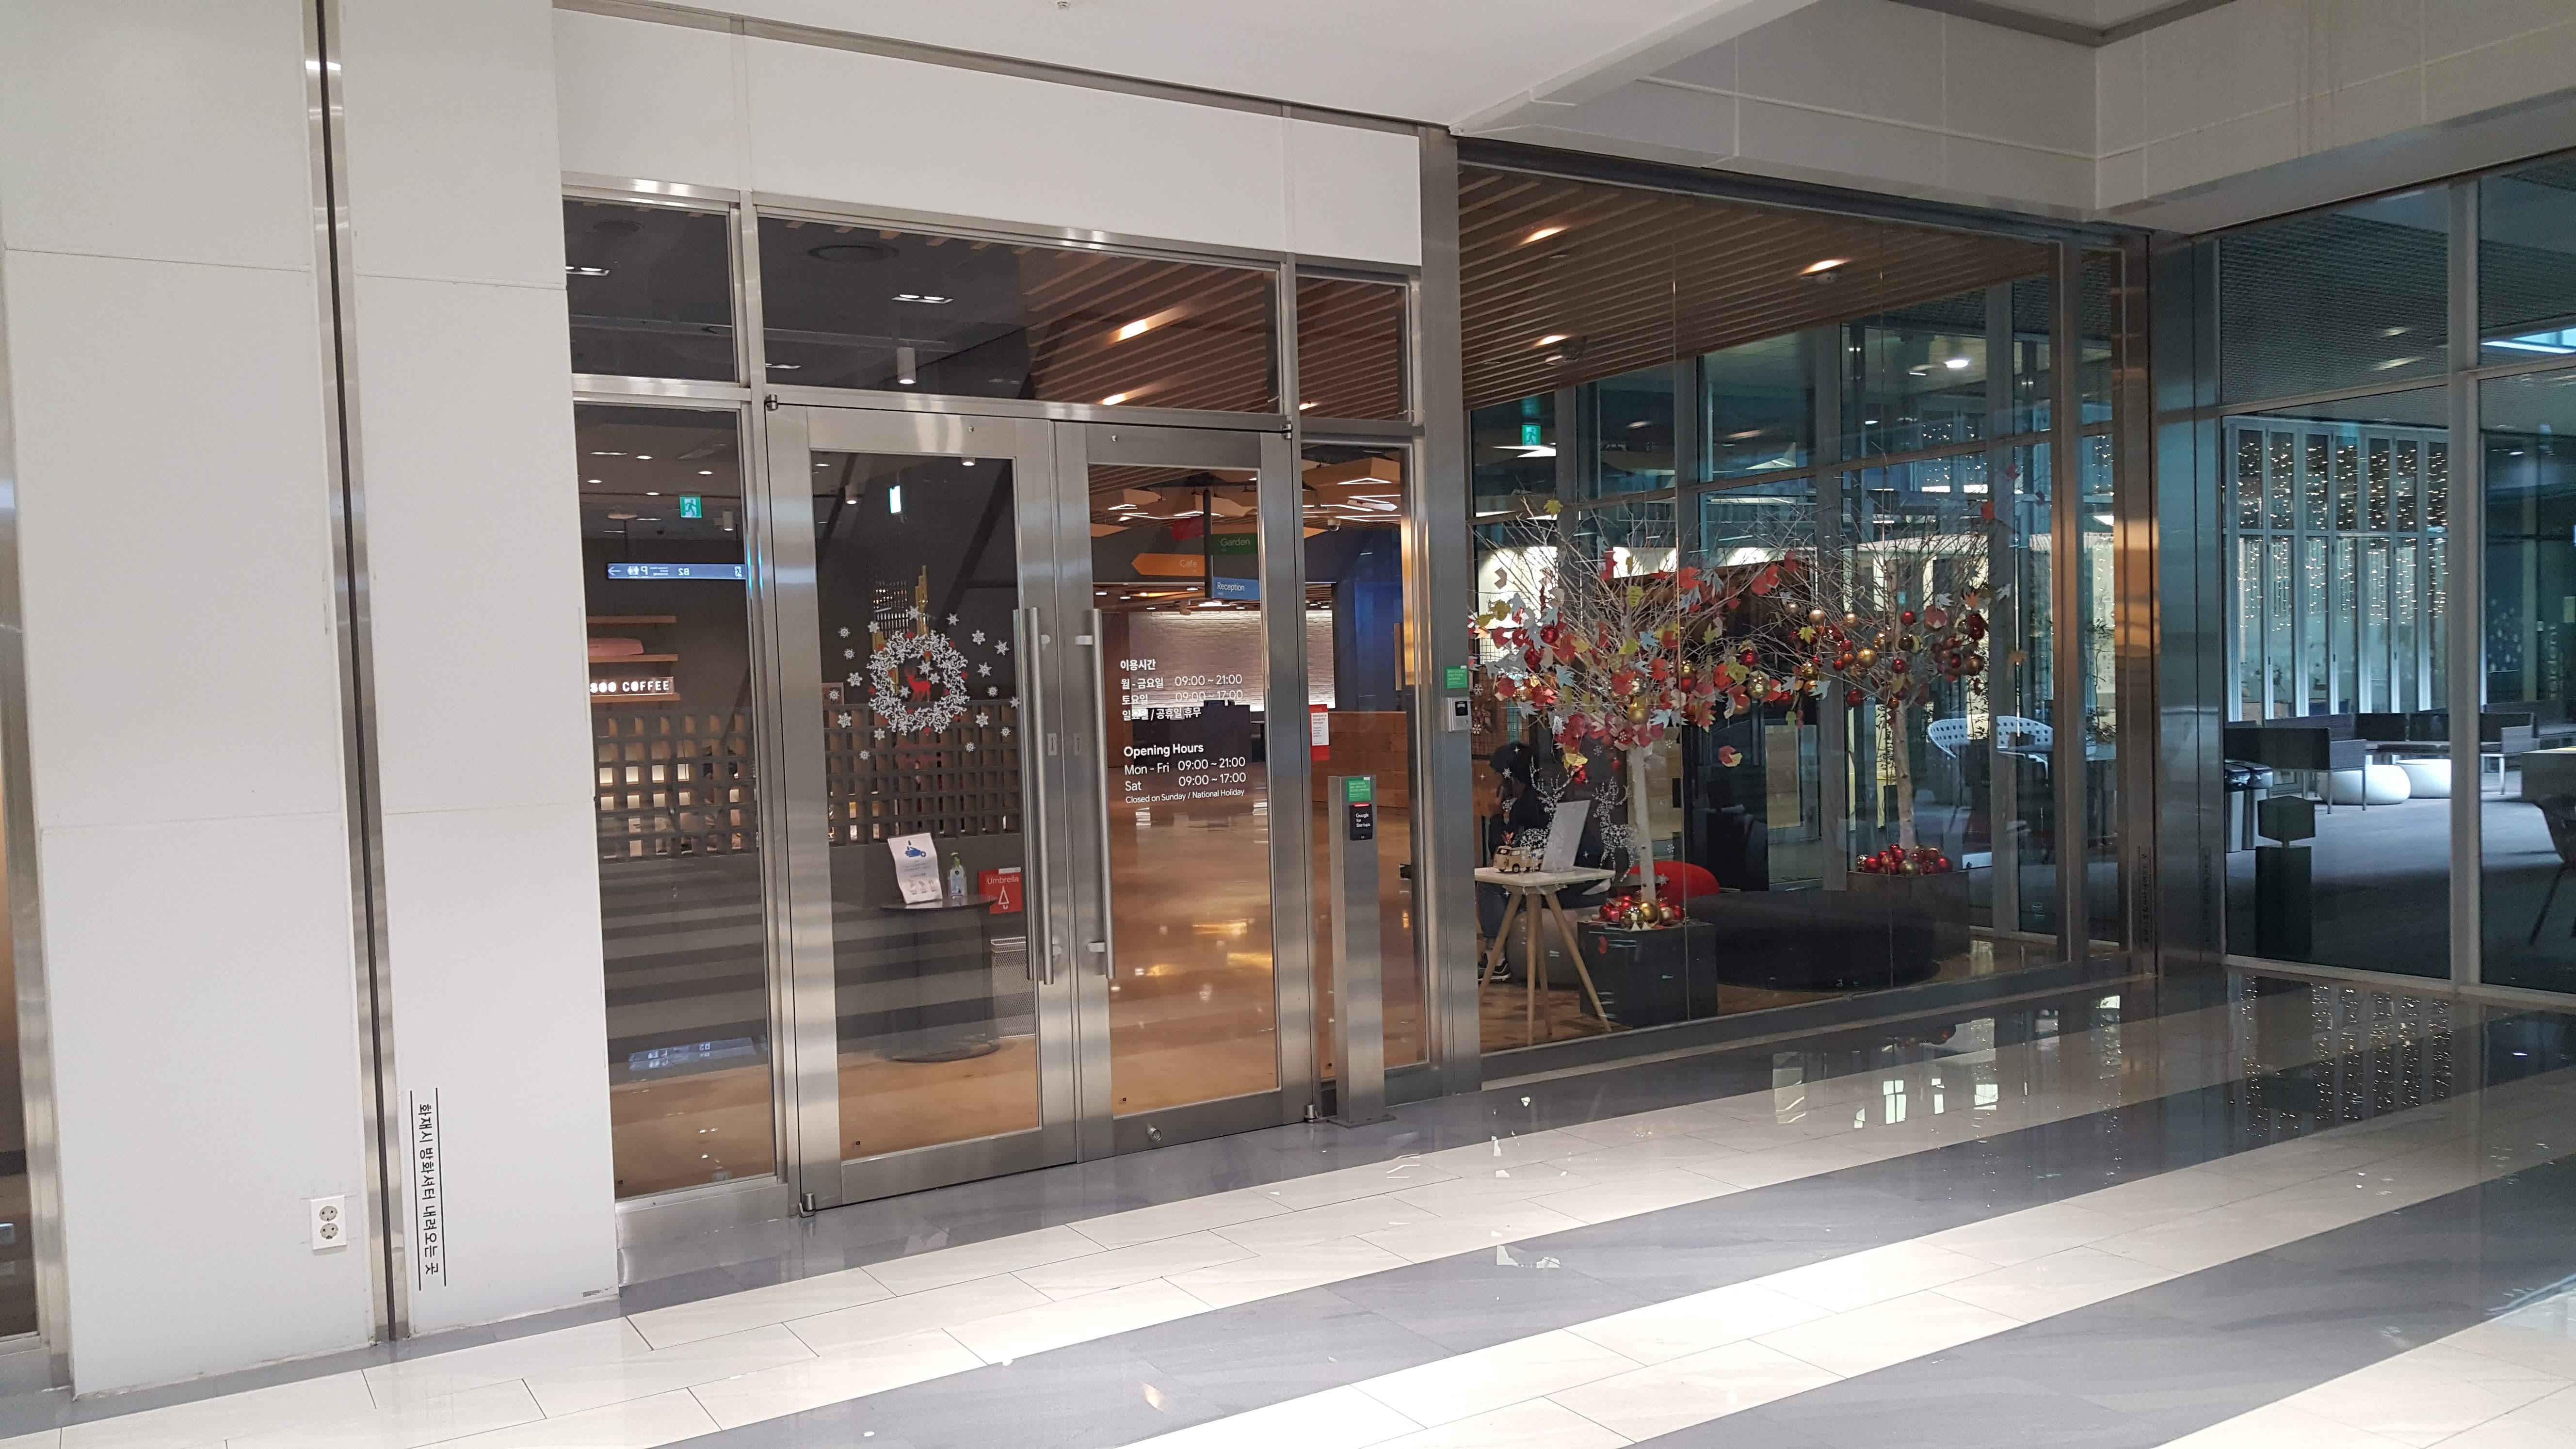 [Google Campus Seoul] 창업가들의 공간, 구글캠퍼스 서울